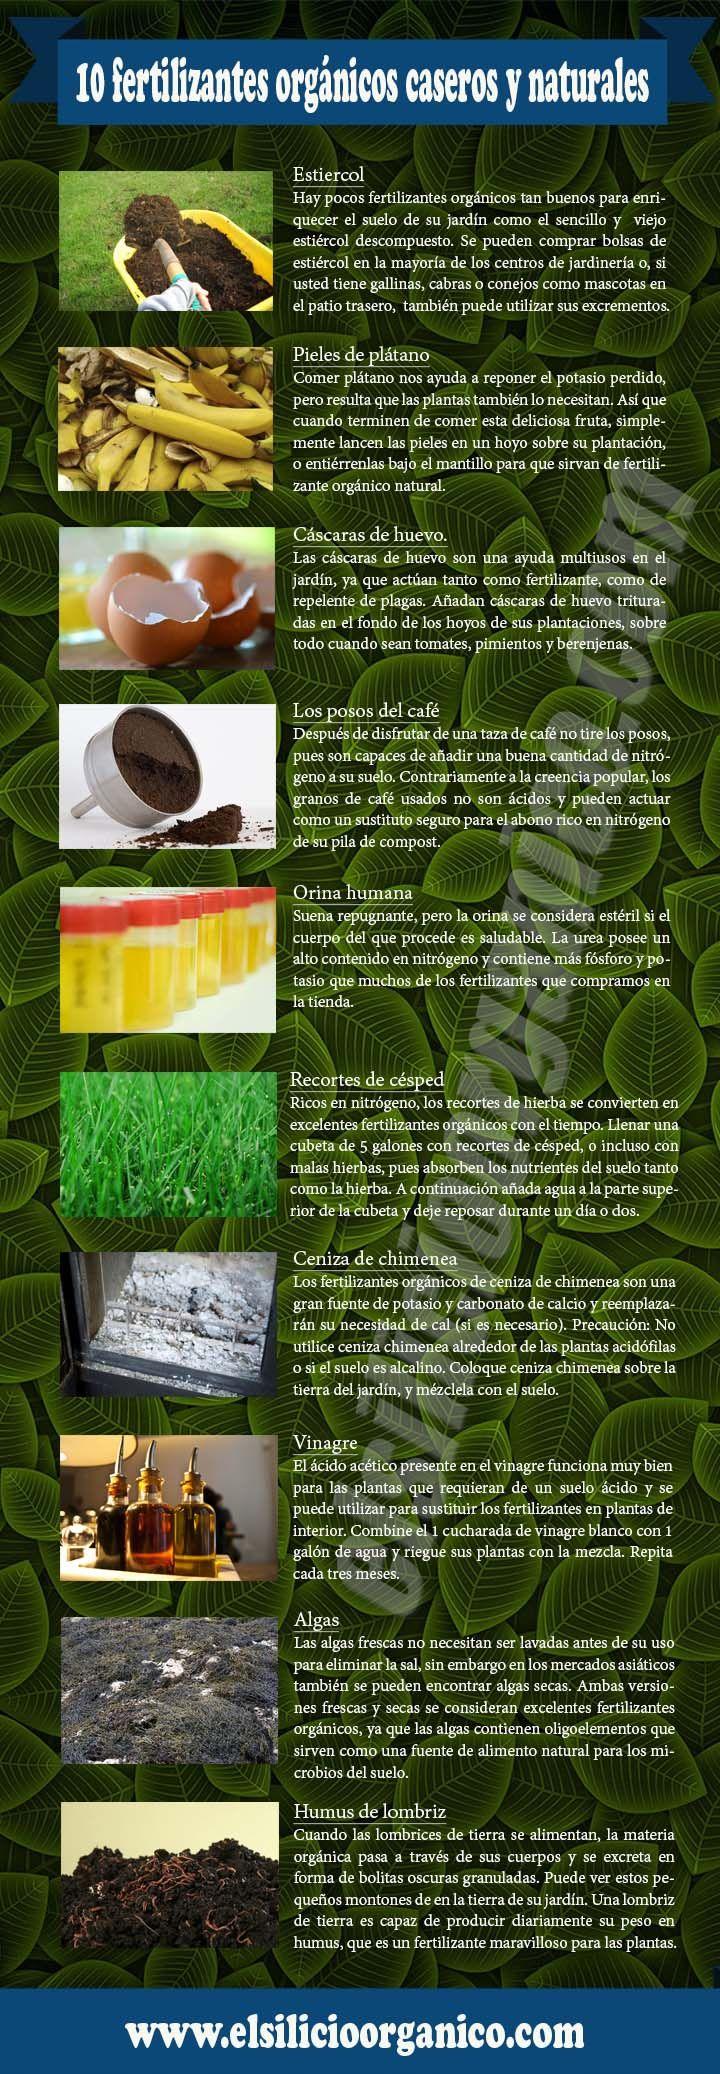 Plantas En Casa, Plantas Plantas, Jardin Plantas, Mini Plantas, Ideas De Plantas, Riego Plantas, Plantas Terrazas, Infografia Plantas, Naturales Infografia